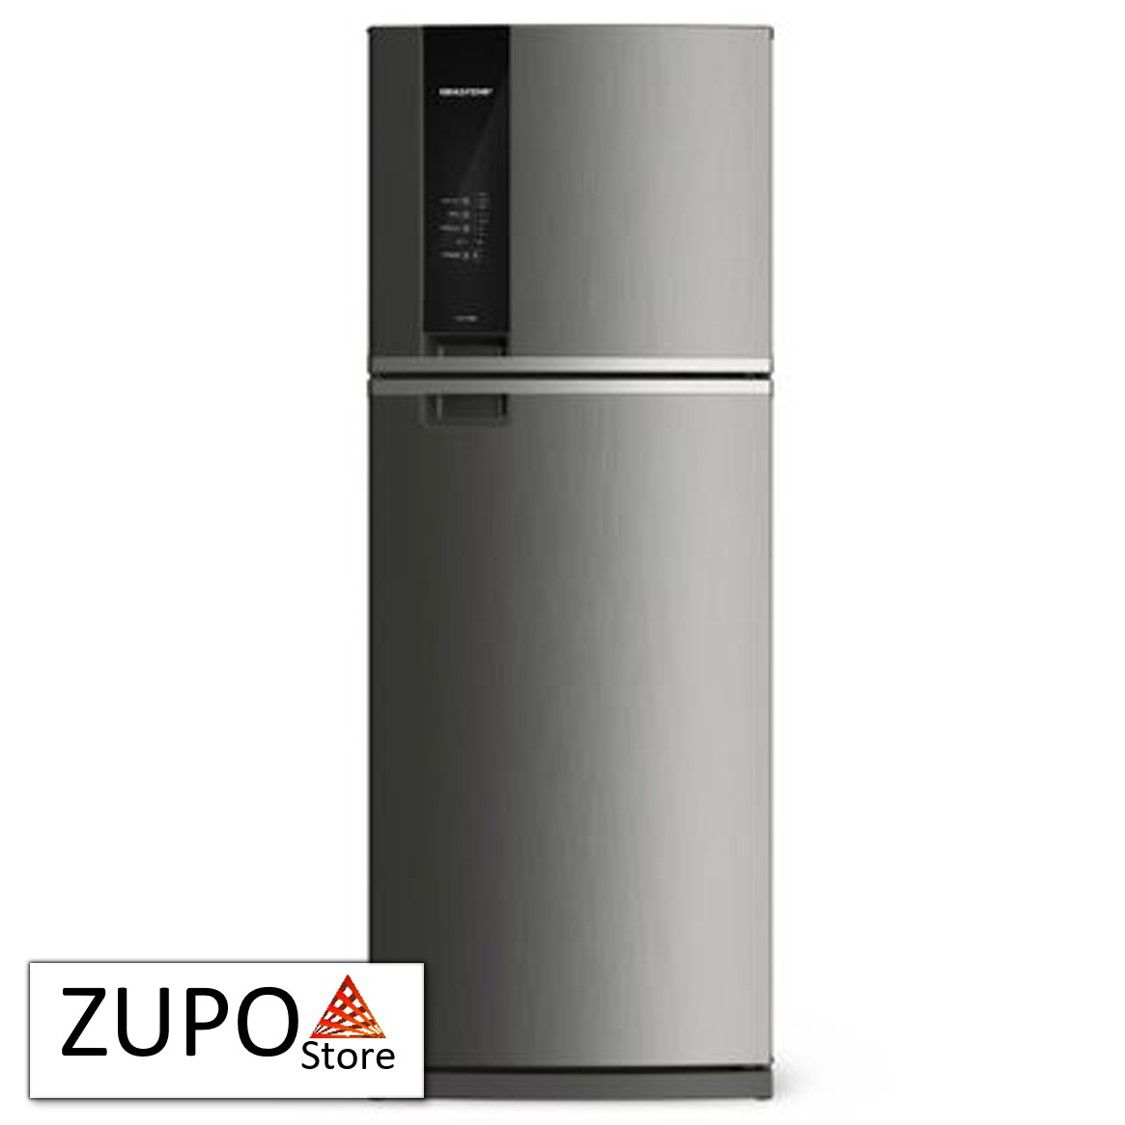 Refrigerador Brastemp 462 Litros Evox Inox - BRM56AK - 127V